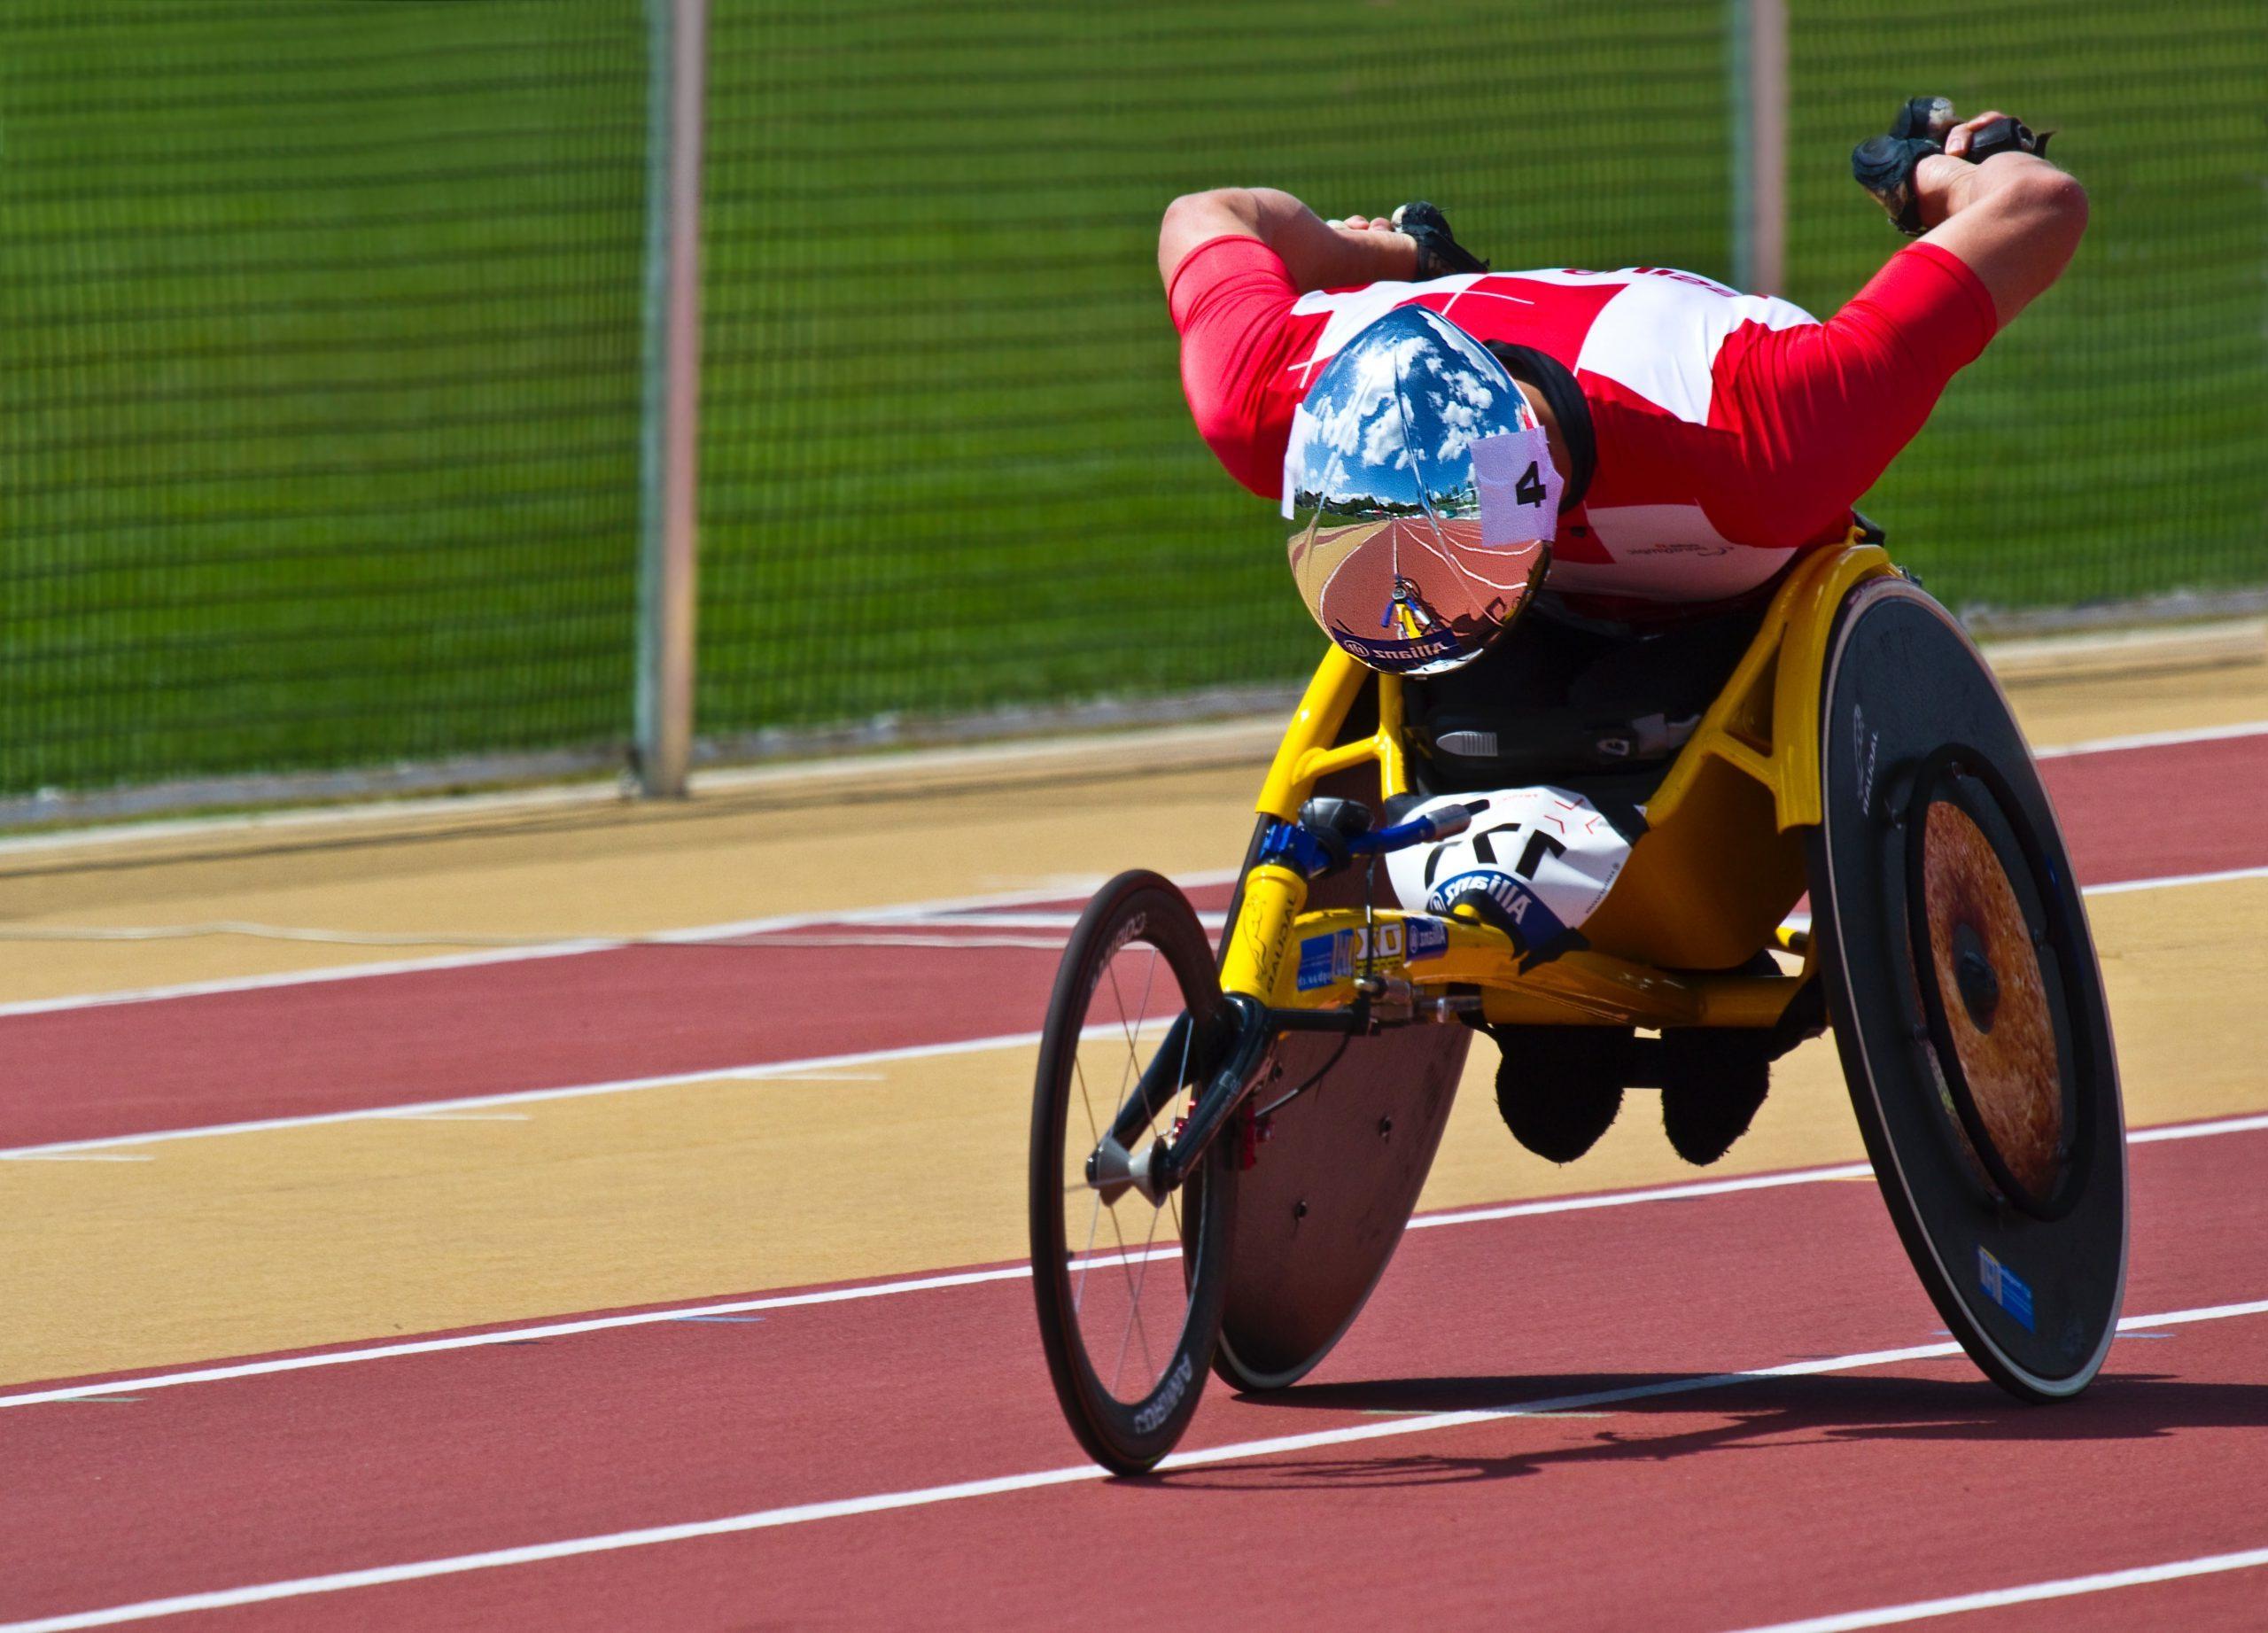 Man on racing wheelchair